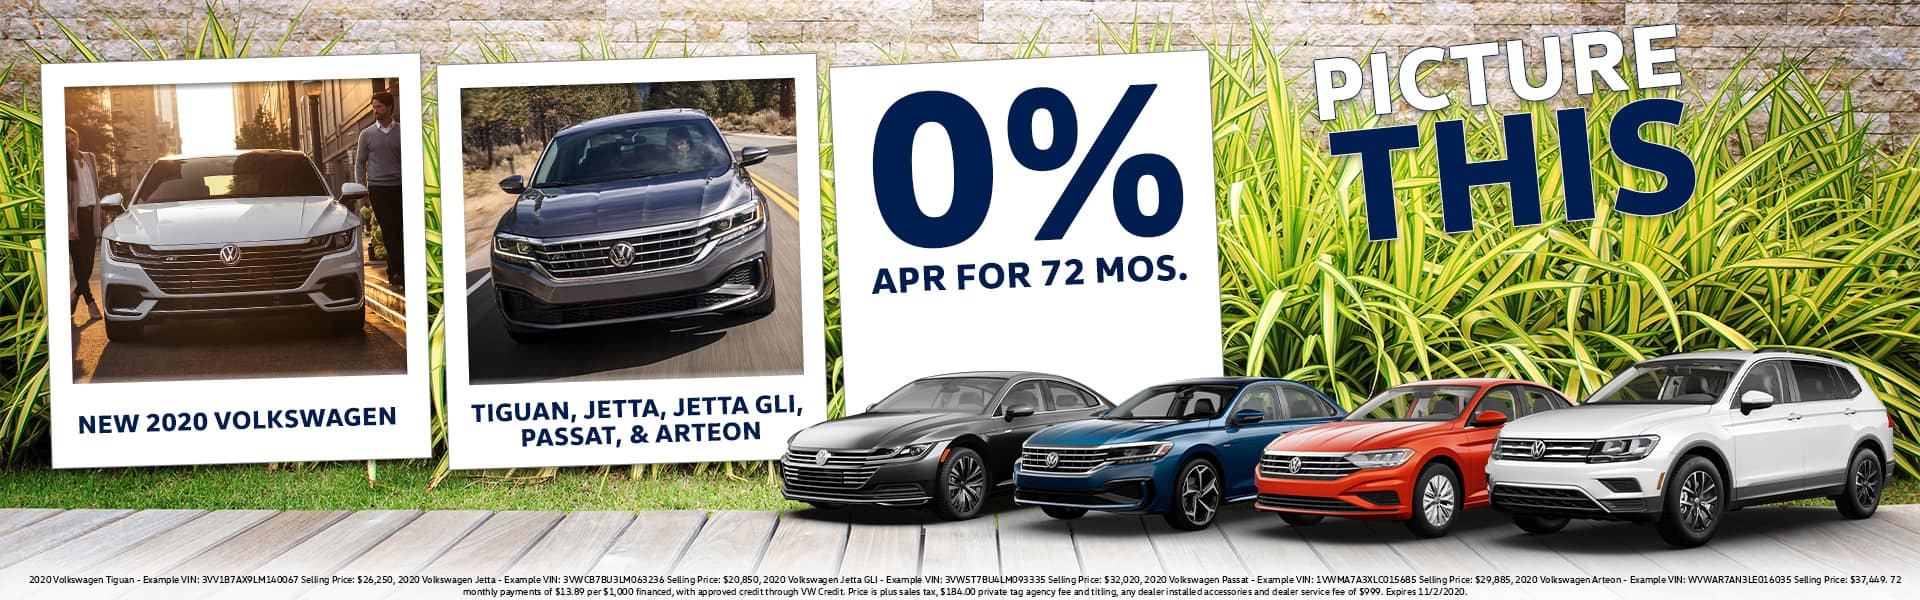 PICTURE THIS | 2020 Tiguan, Jetta/GLI, Passat, Arteon Models | 0% APR For 72 Months